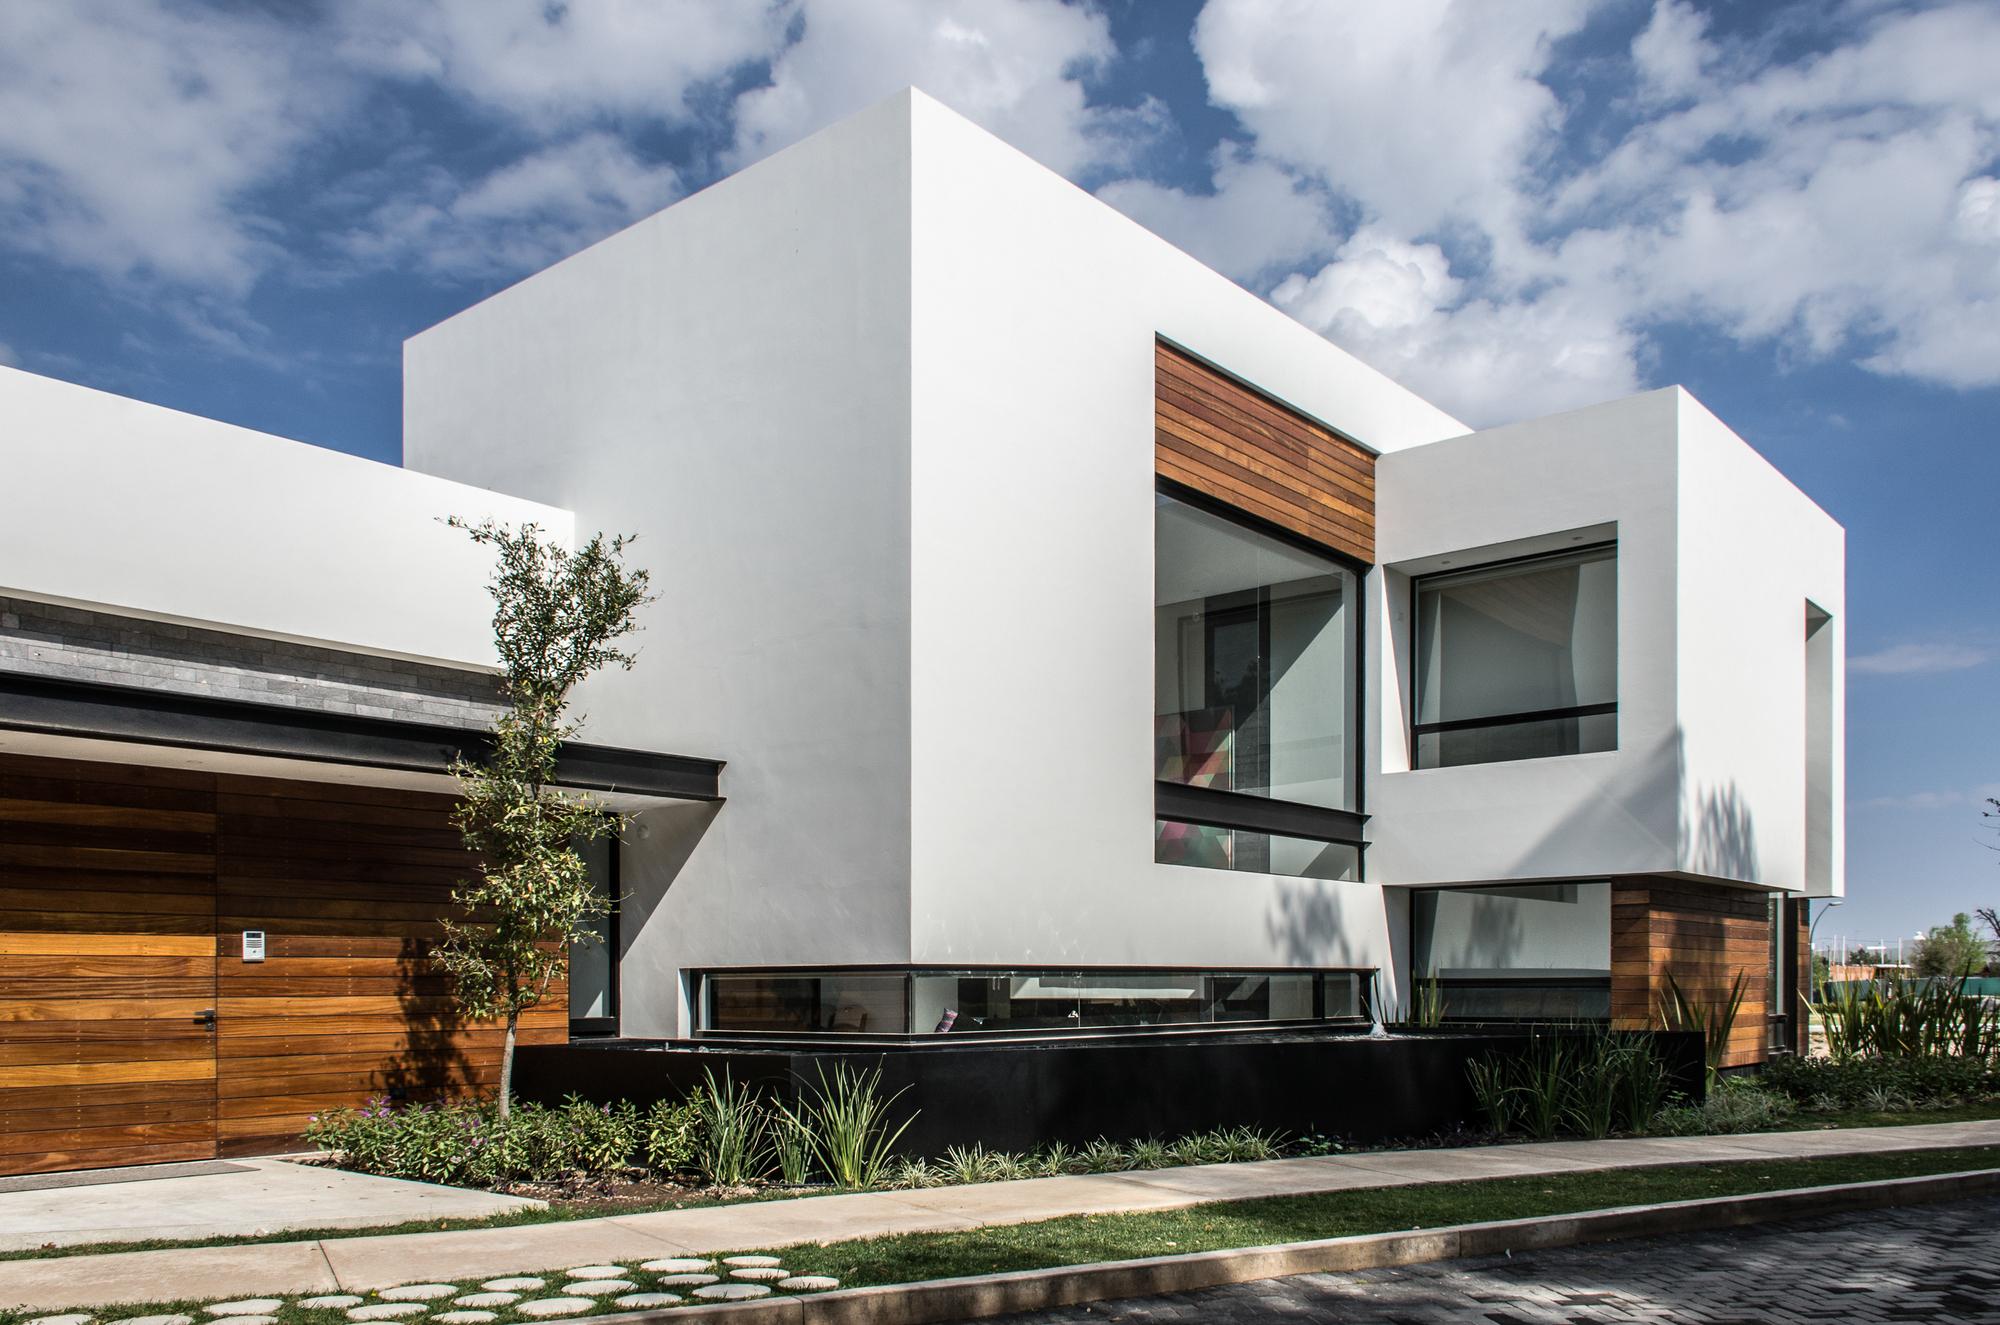 Galer a de casa agr adi arquitectura y dise o interior 16 for Arquitectura y diseno de casas